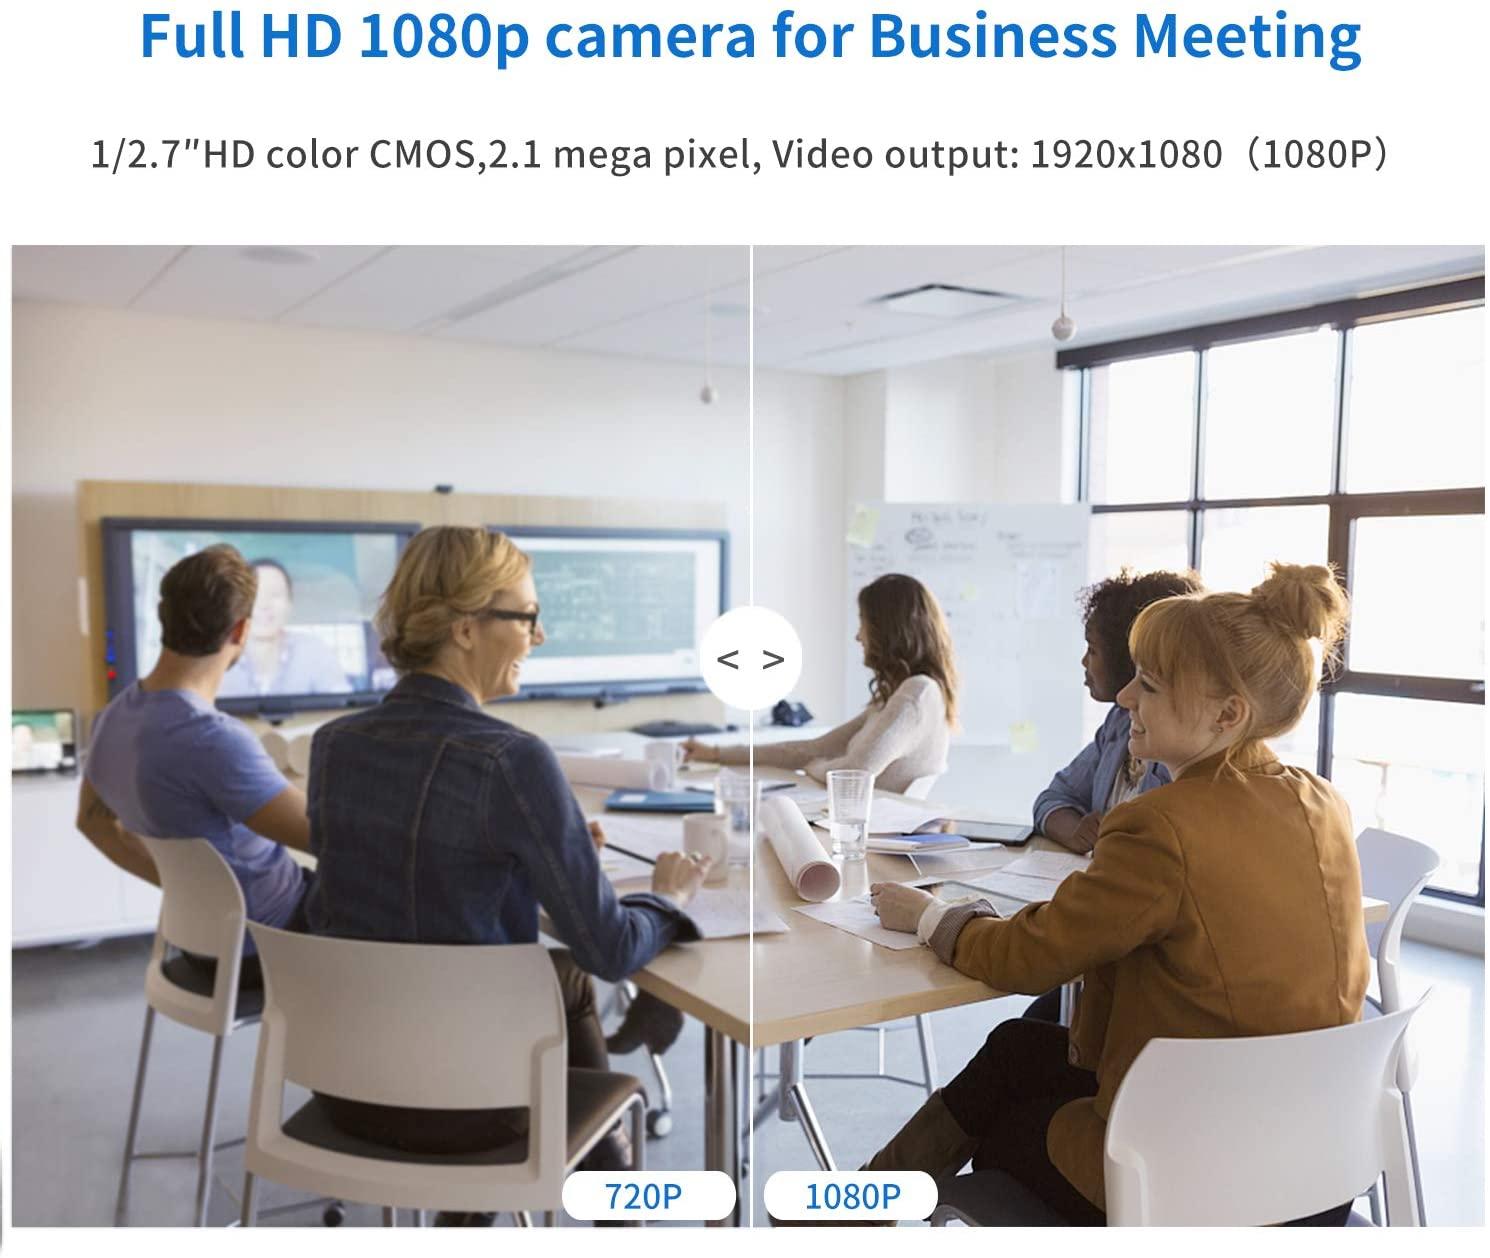 Tenveo TEVO-NV10U web会議 カメラ 10倍光学ズーム 1080p skype会議用 高画質 自動フォーカス usbカメラ 広角 PTZ ウェブカメラ VA3000シリーズ